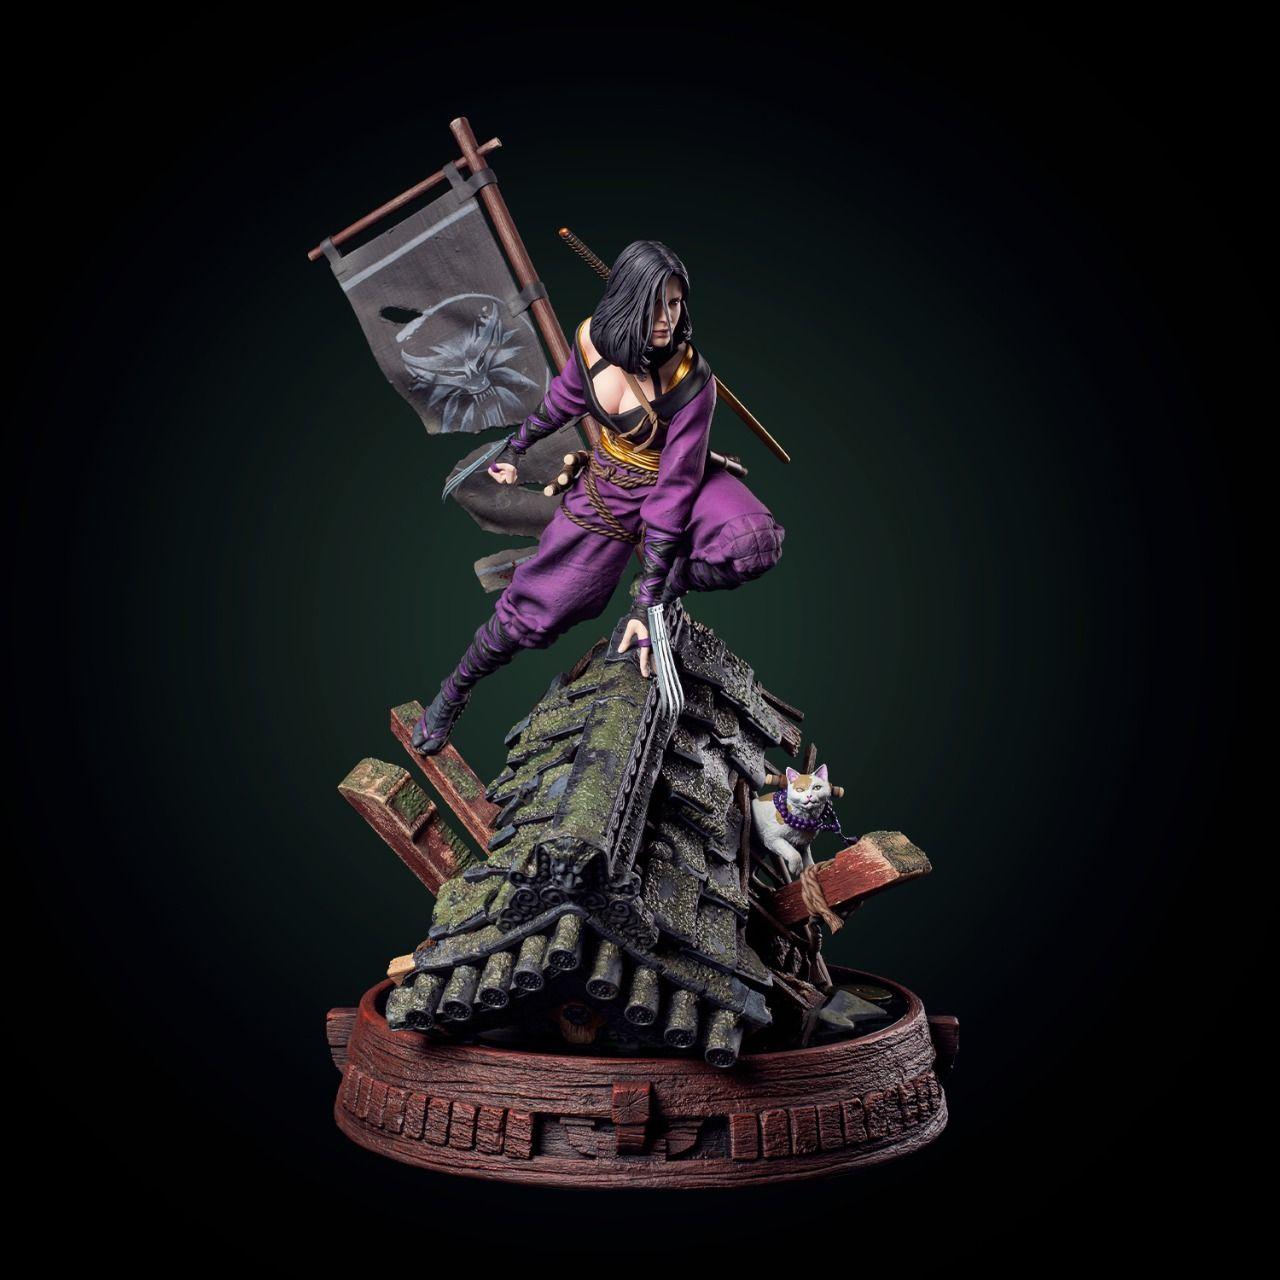 Wiedźmin 3: Dziki Gon - figurka Kunoichi Yennefer